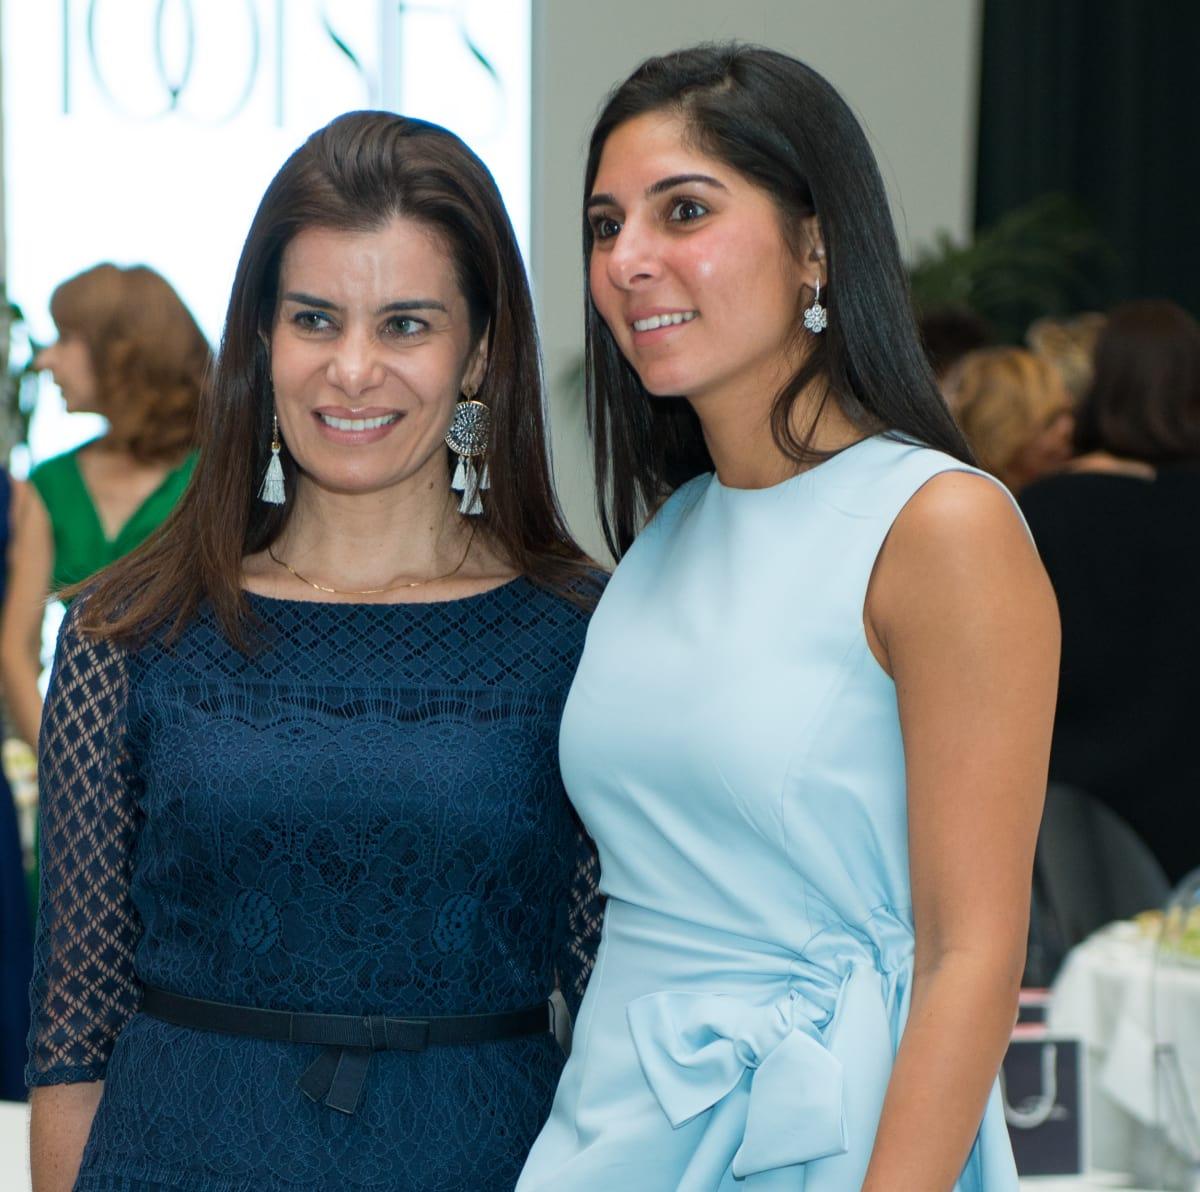 Mona Sarofim, Maria Munoz at Oscar de la Renta fashion show at MFAH